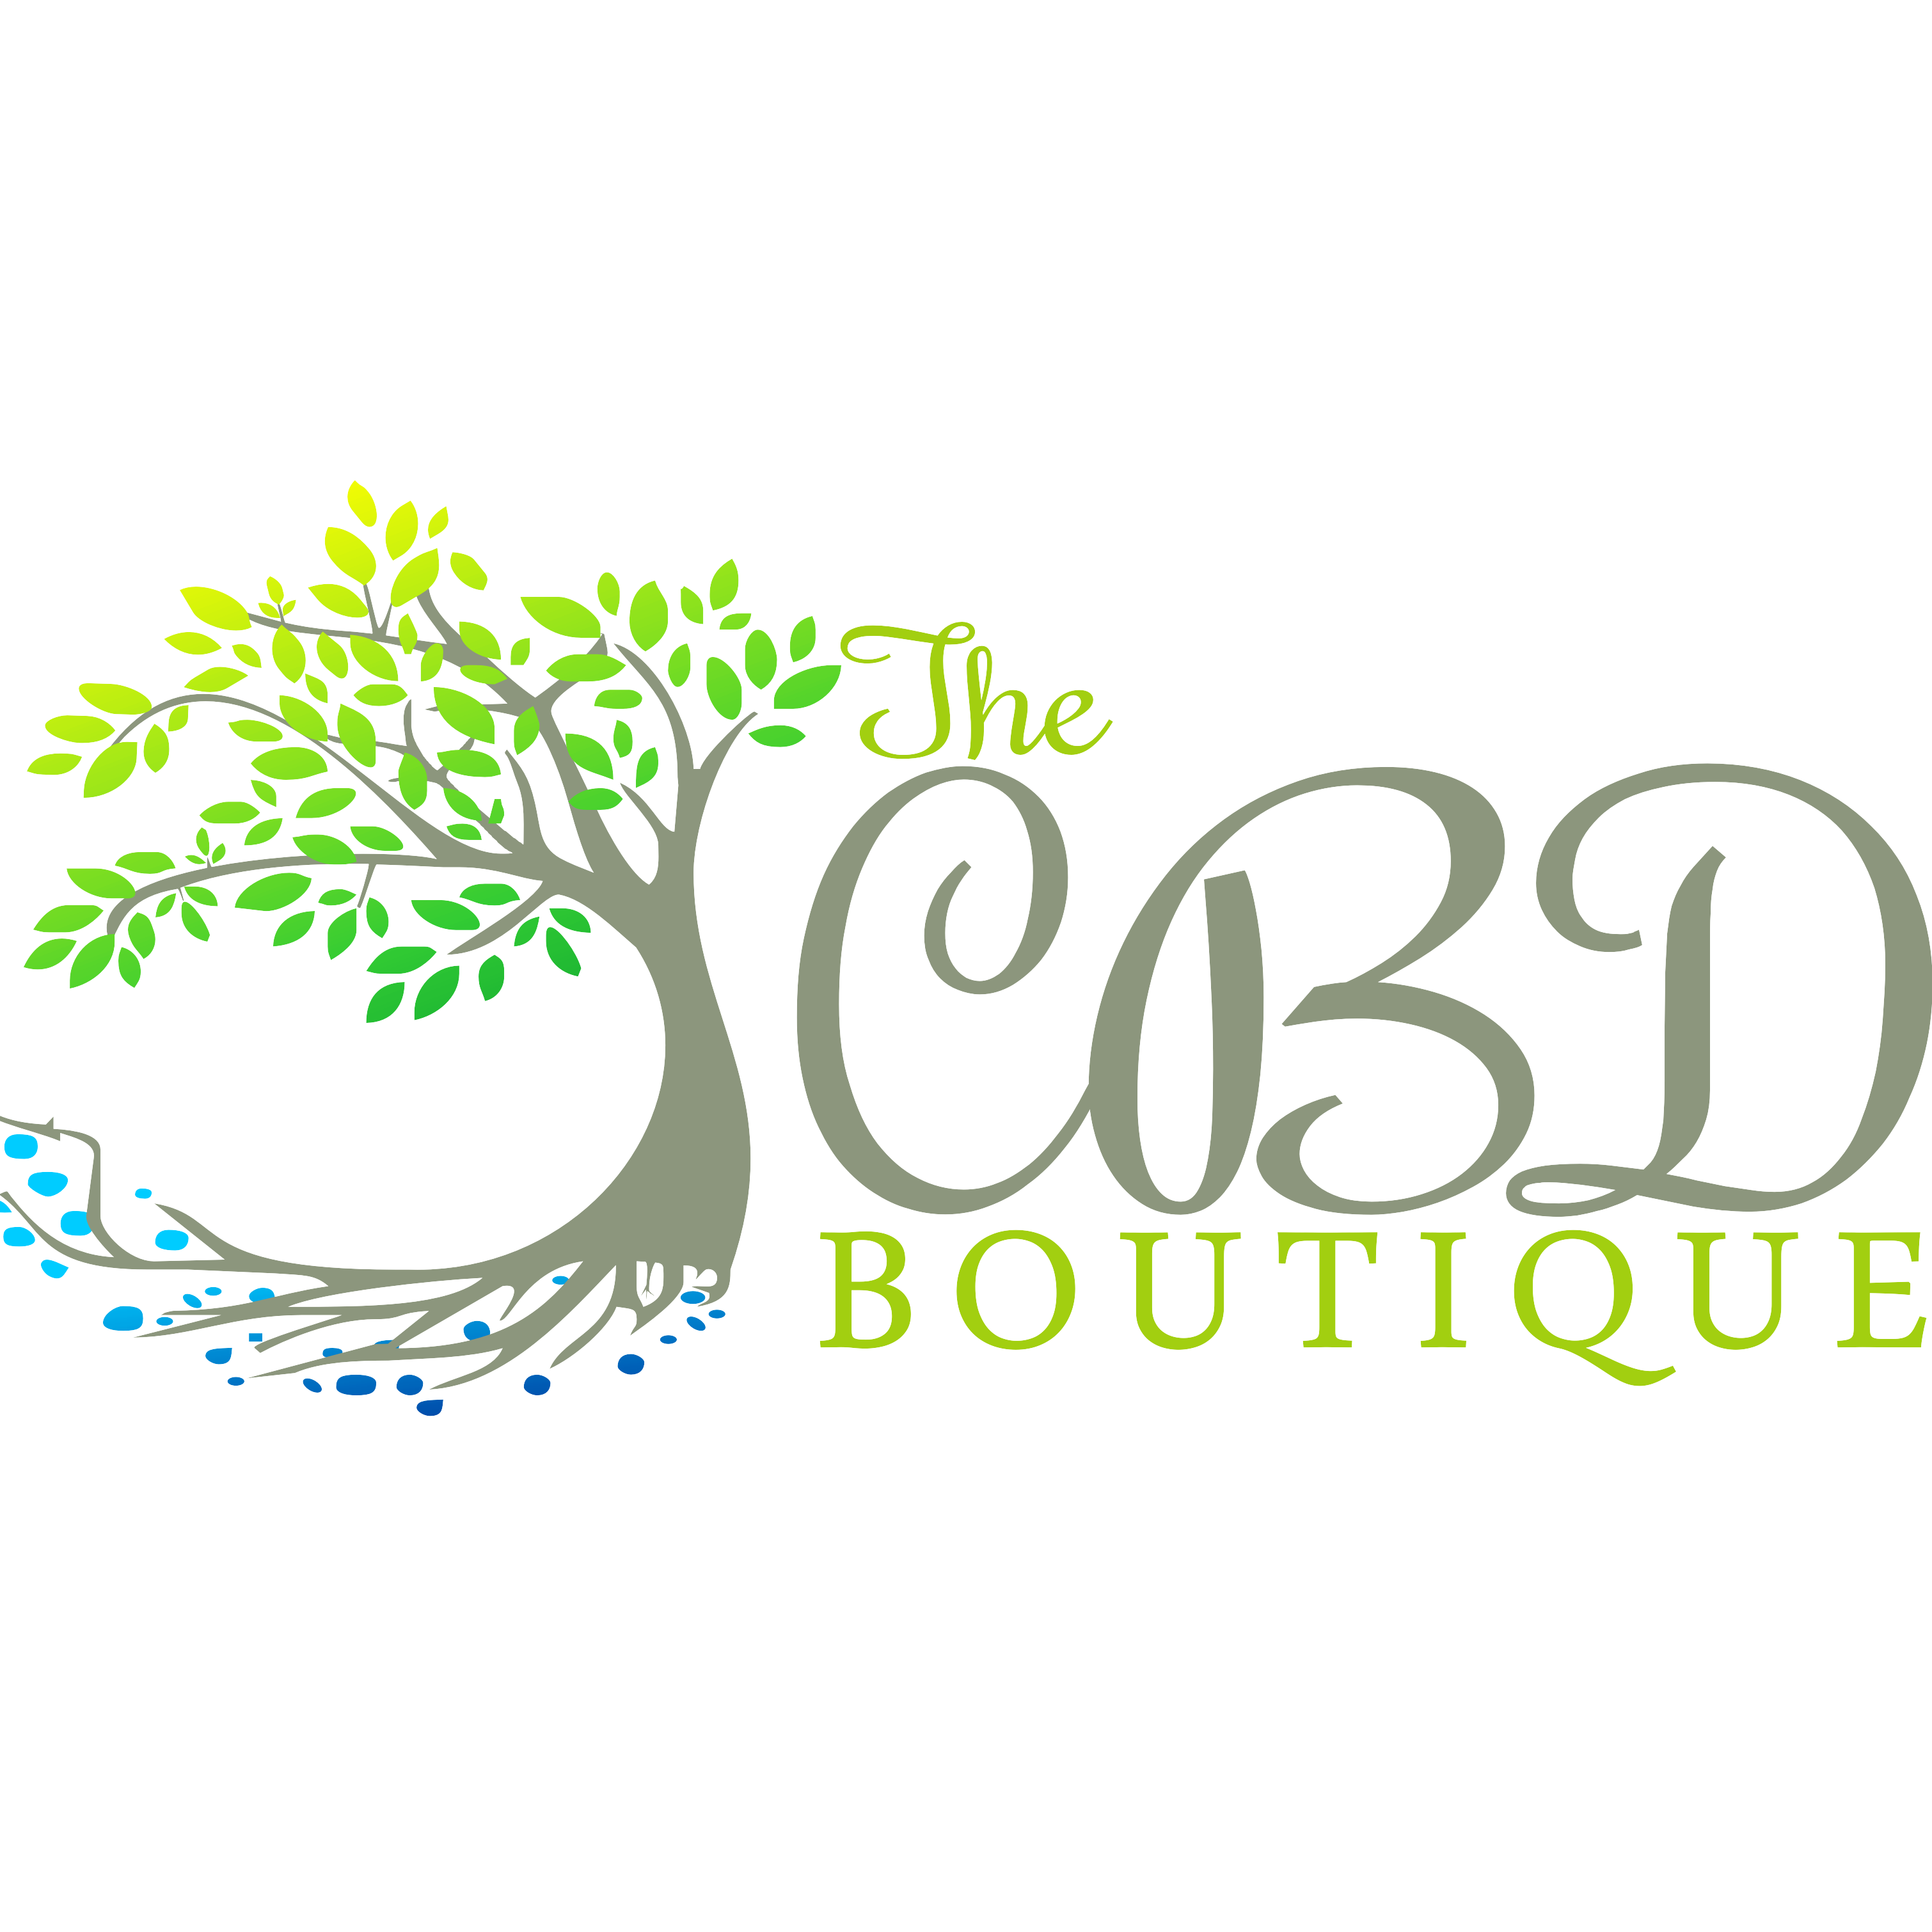 The CBD Boutique - Albuquerque, NM - Alternative Medicine